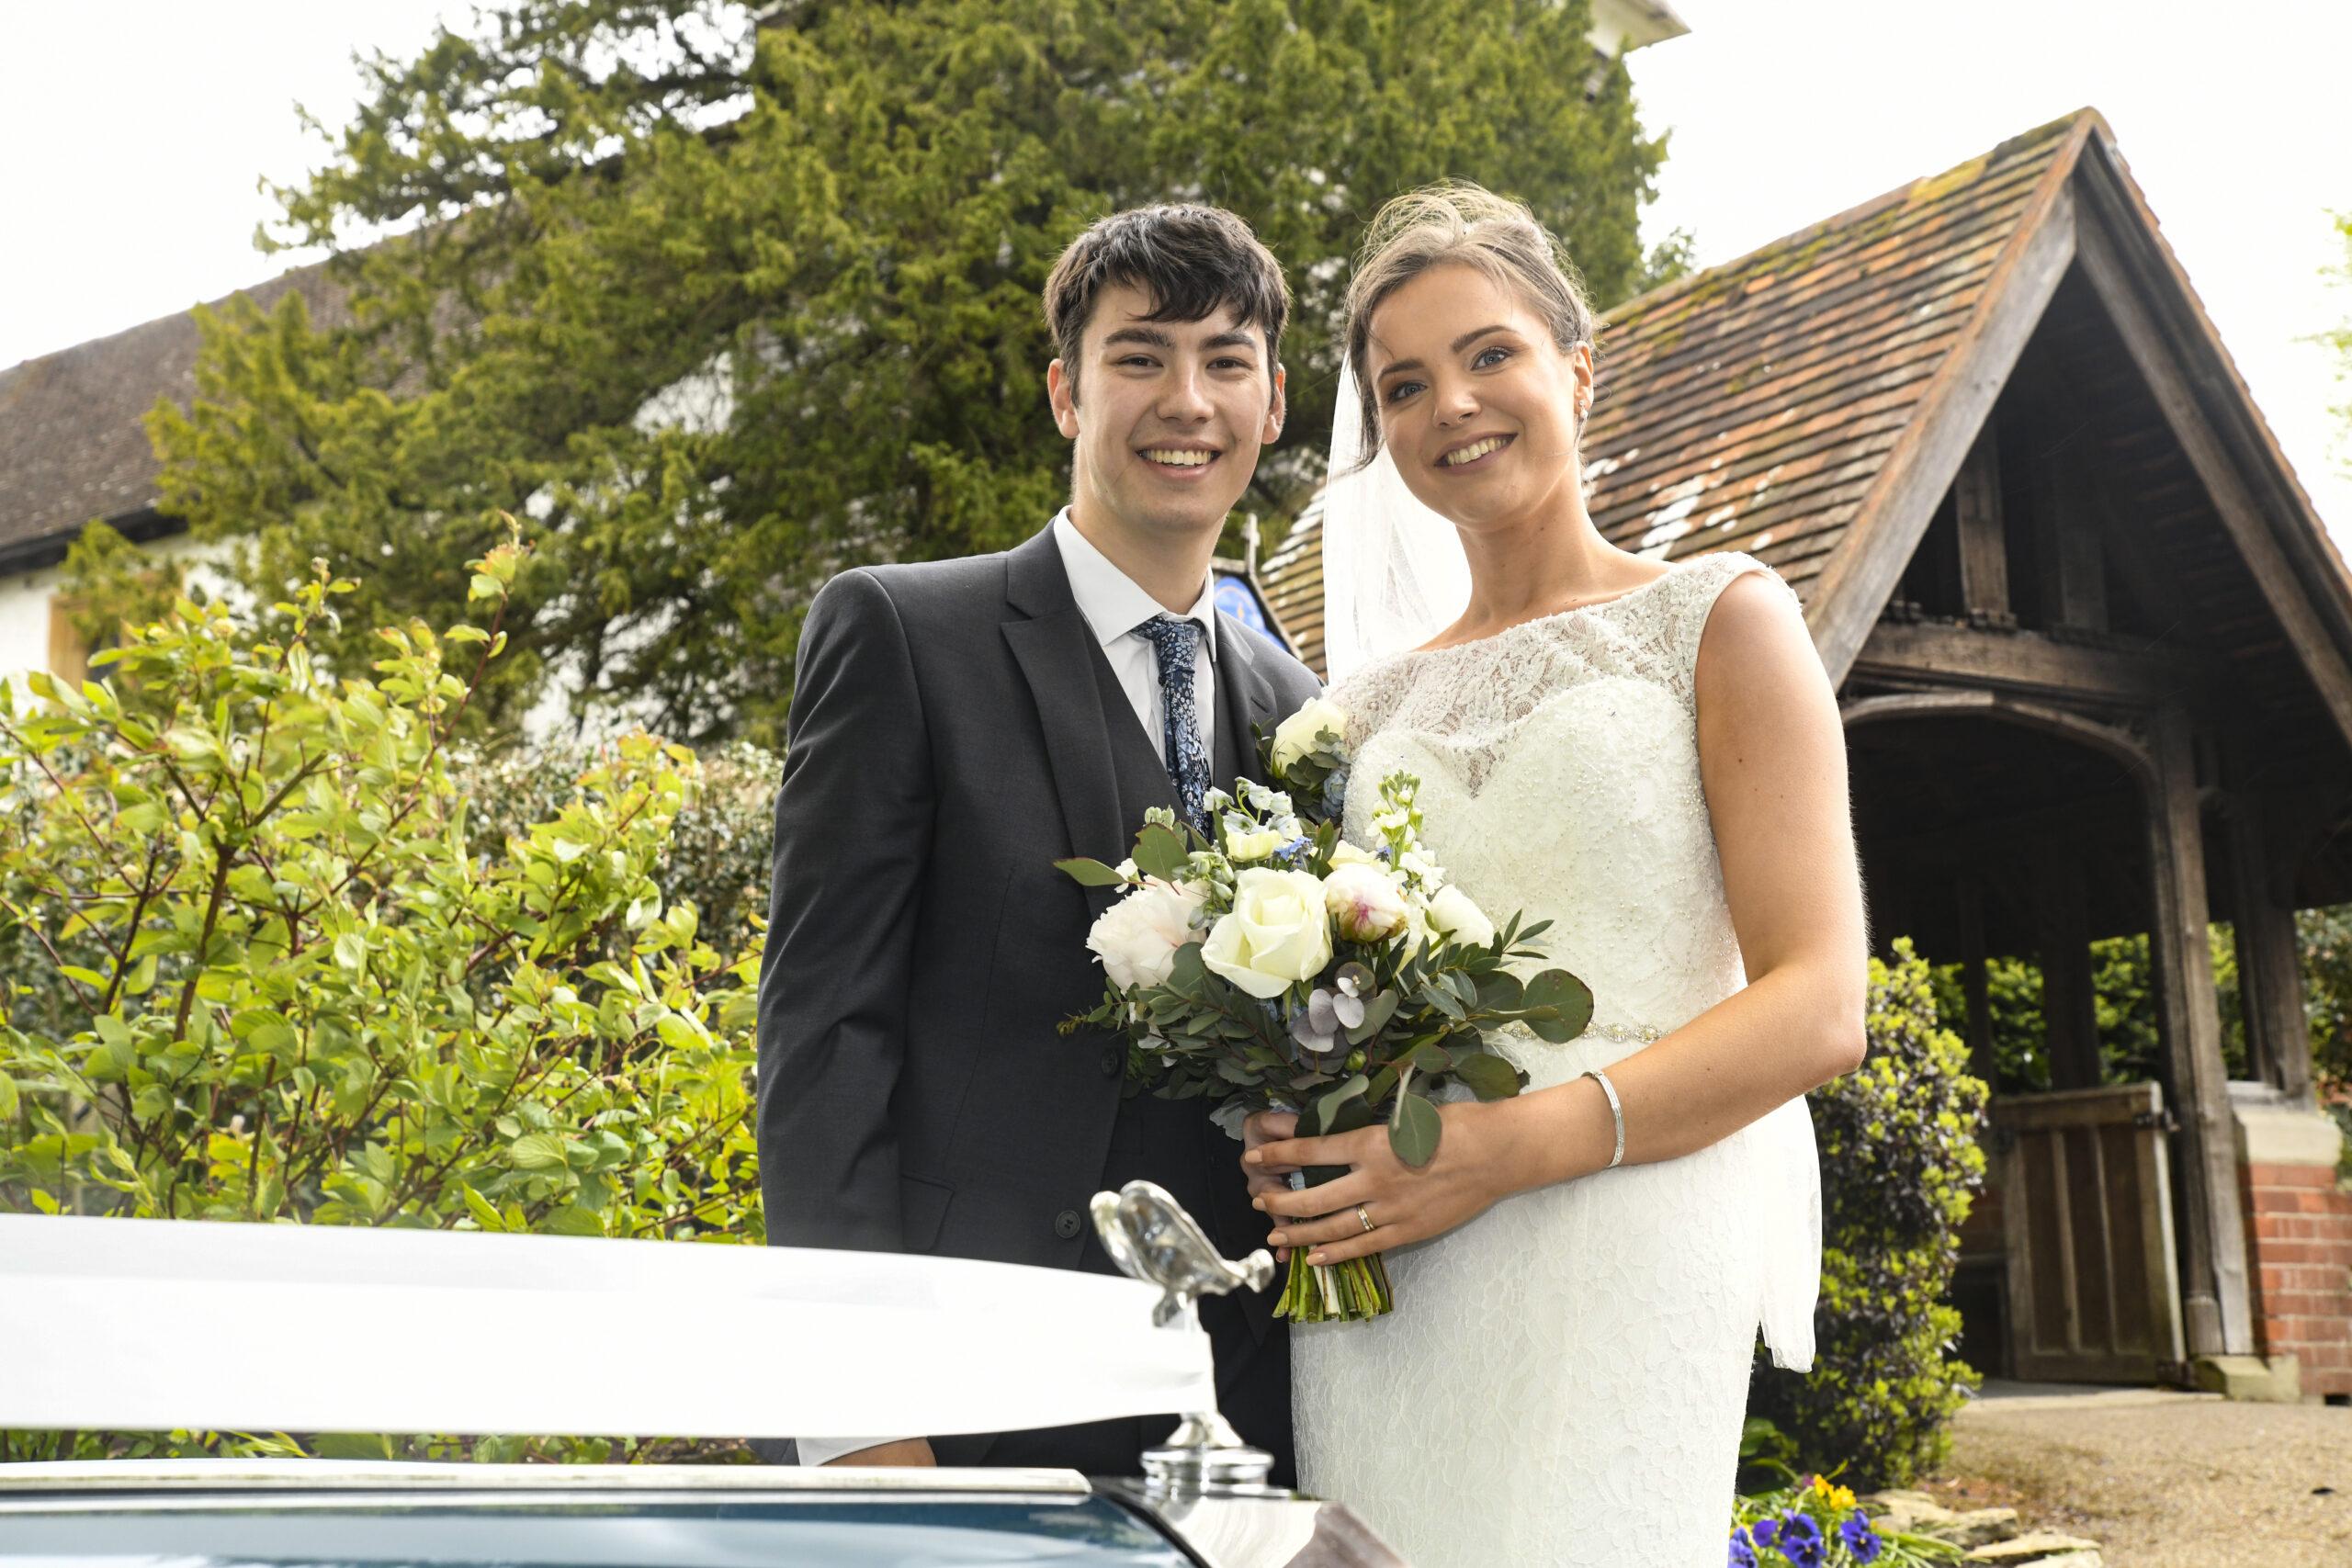 Laura & Nathans Wedding Photography in Farnborough